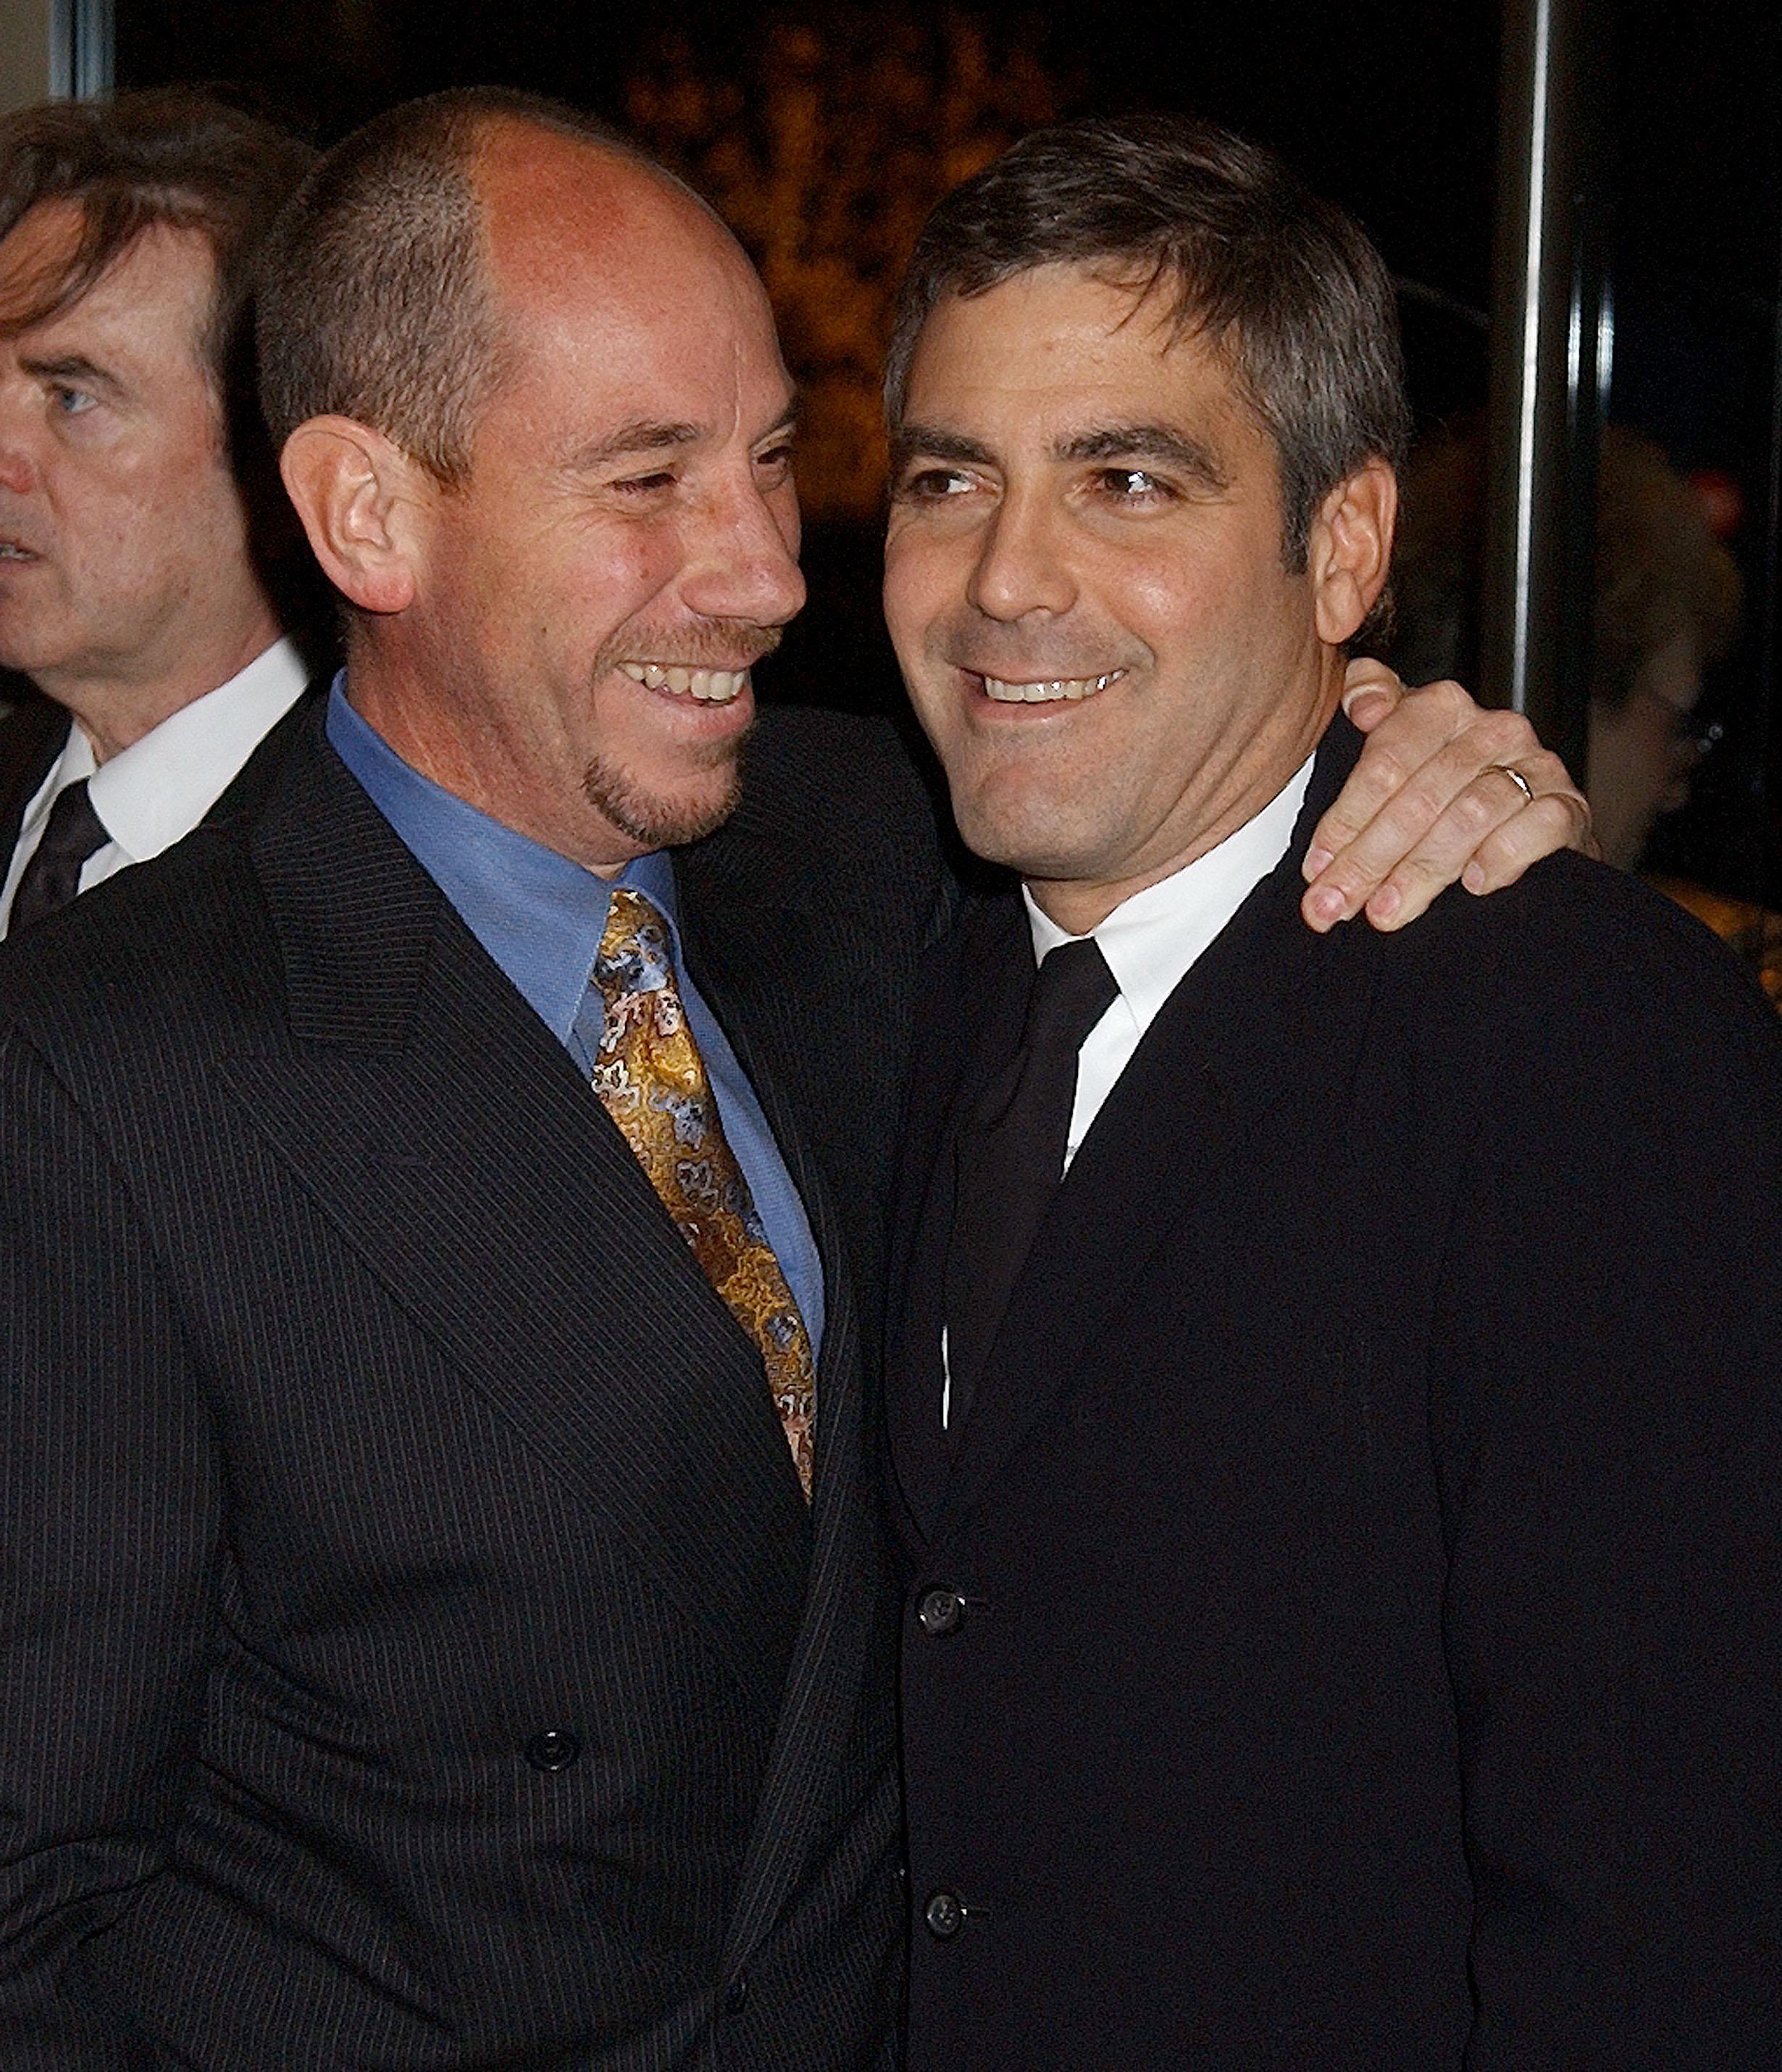 George-Clooney-Miguel-Ferrer